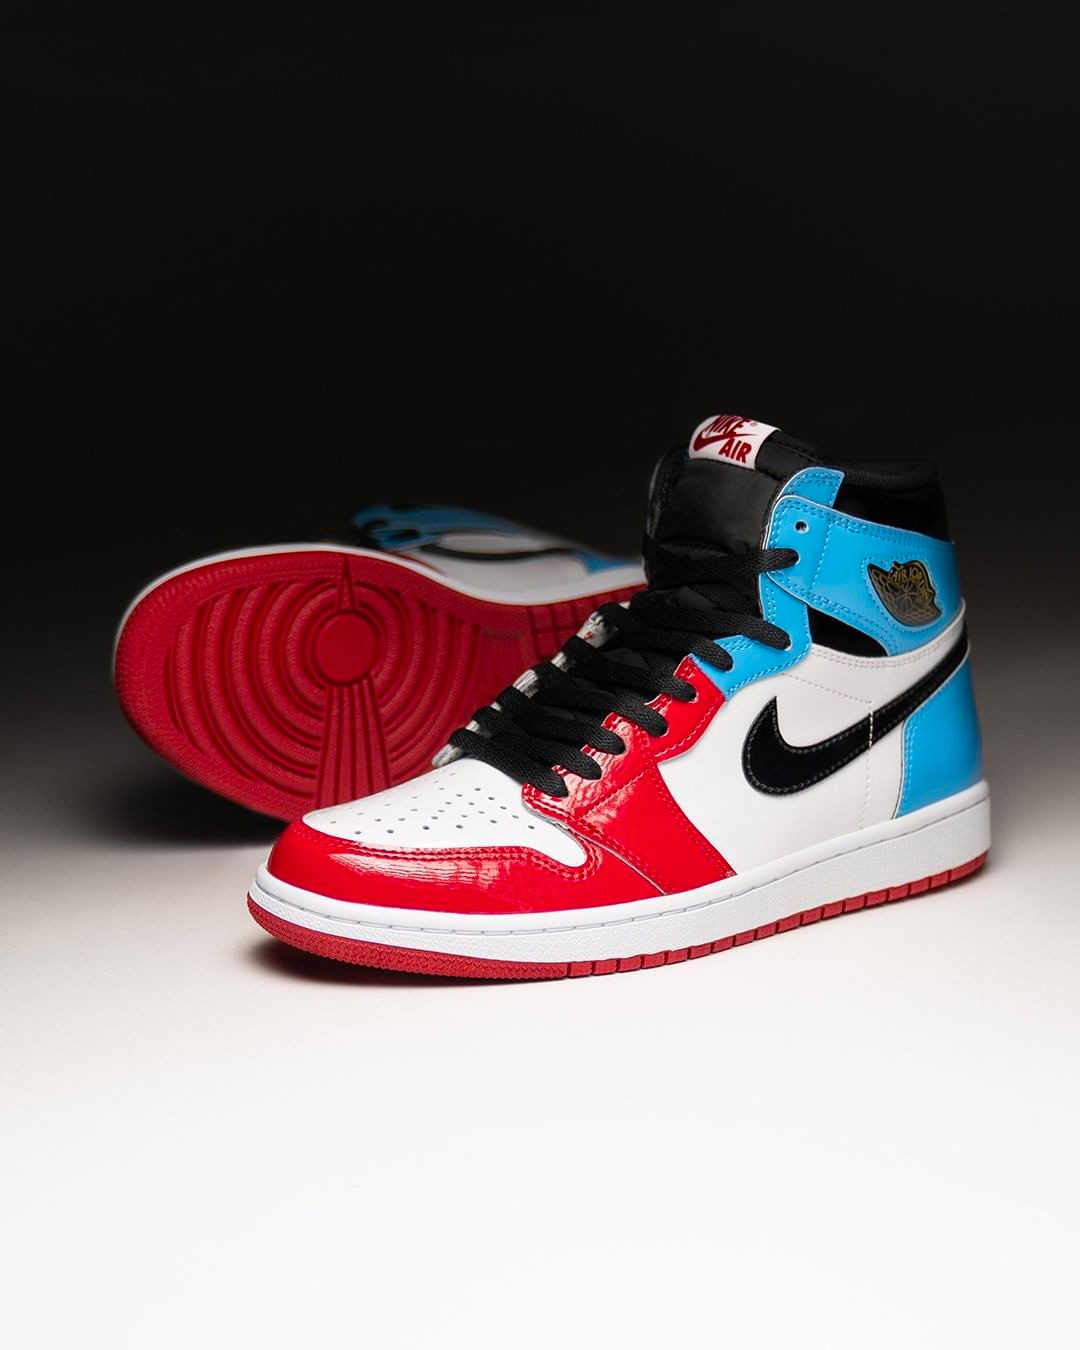 CK5666-100,AJ1,Air Jordan 1 CK5666-100 警灯 Air Jordan 1 下周发售!来看看实际上脚效果如何